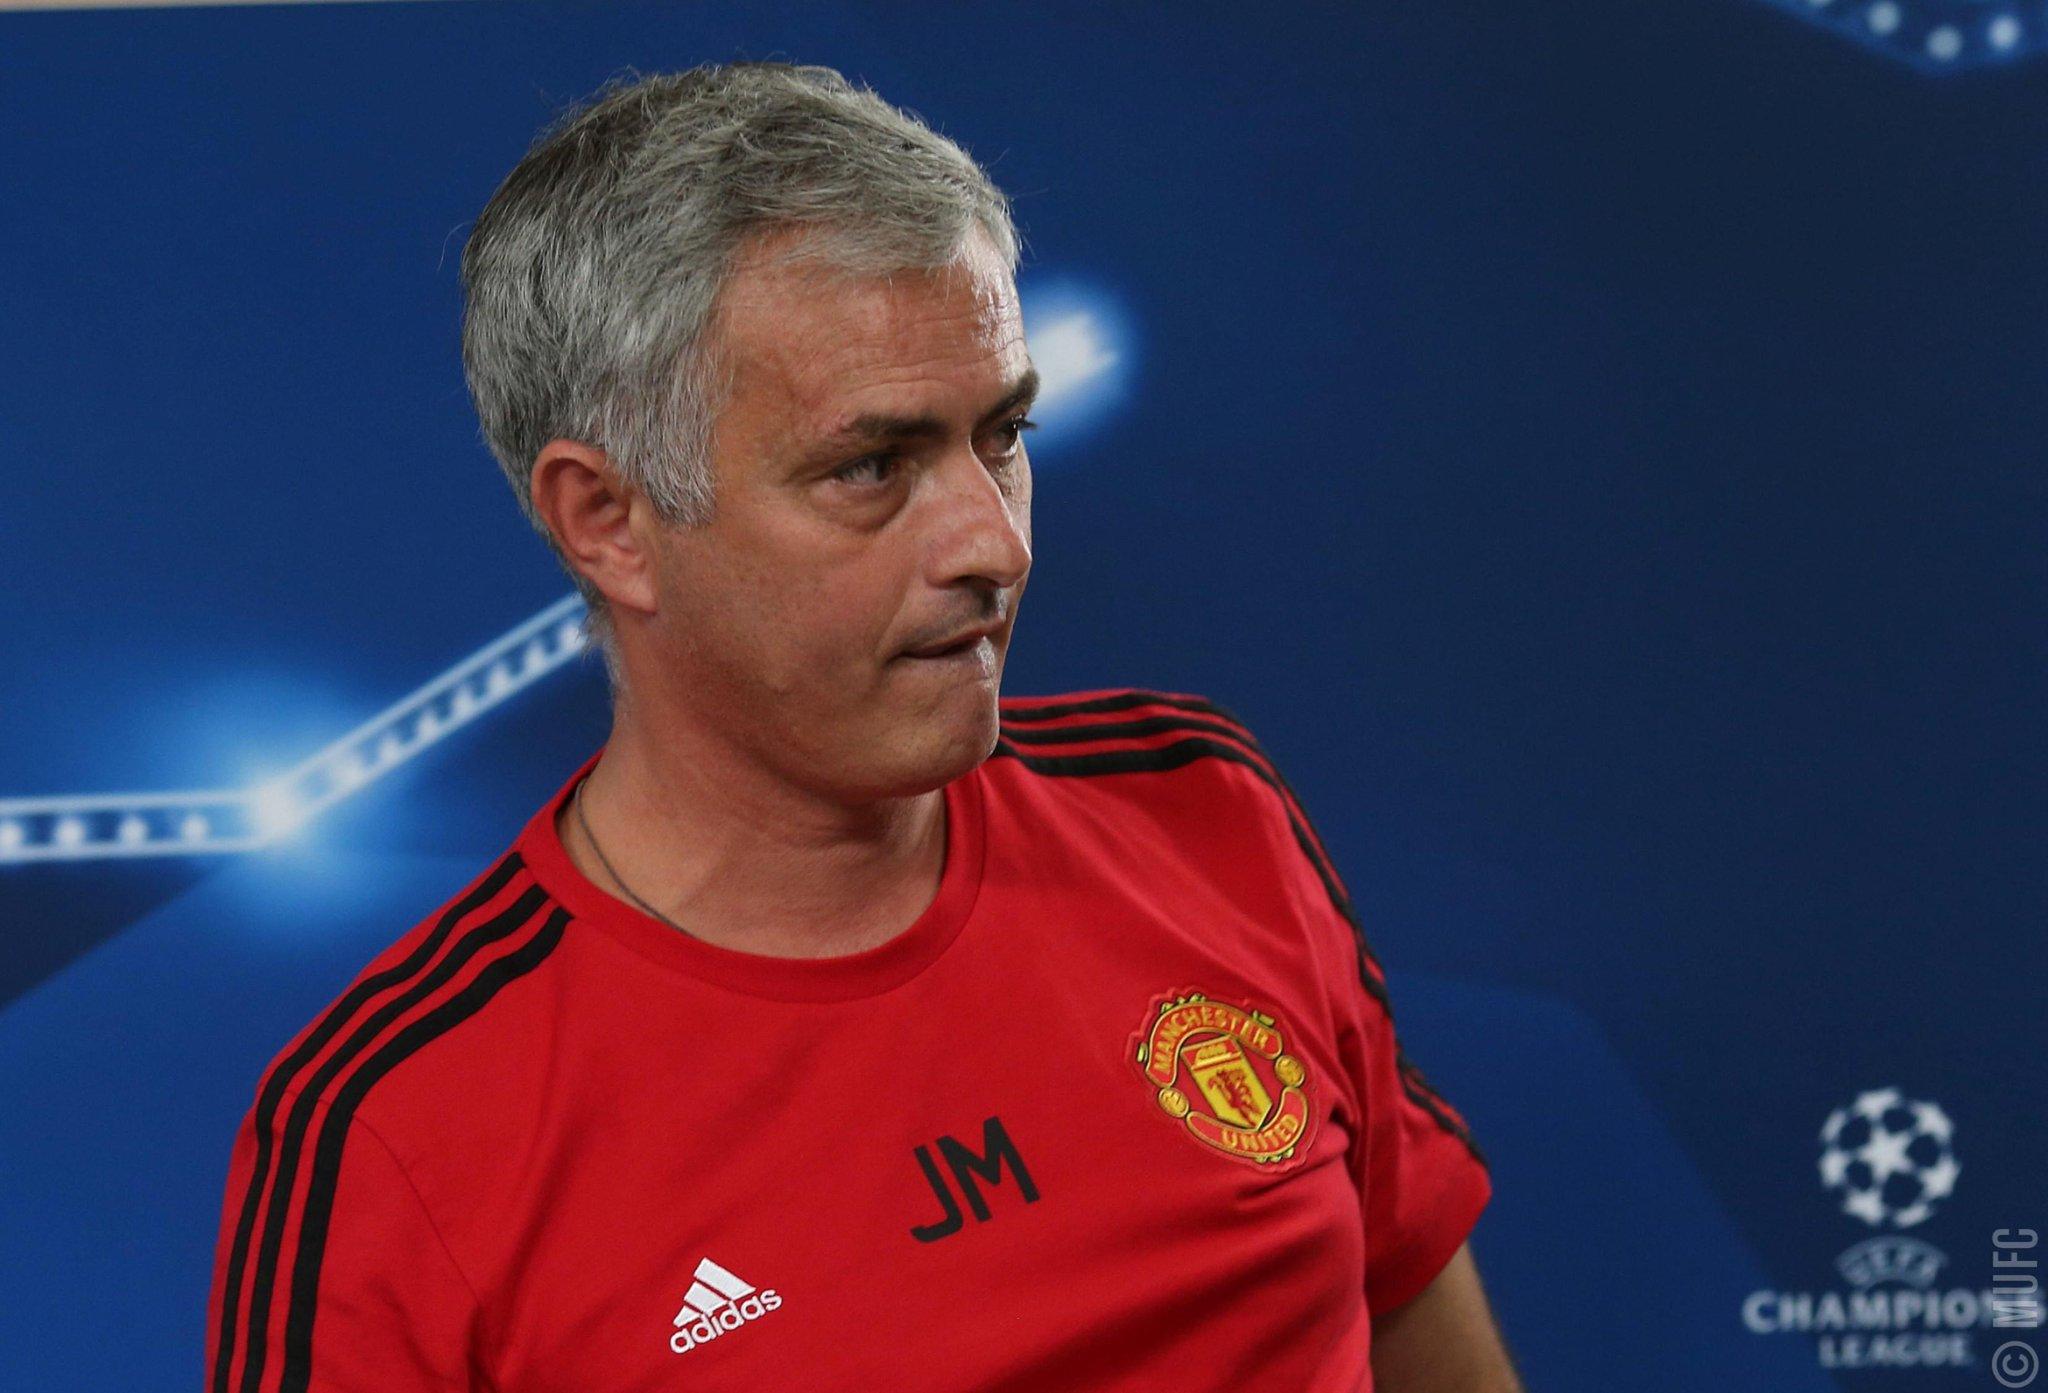 Jose Mourinho clarifies his comments on his #MUFC future: https://t.co/Lsb6fUCkHe https://t.co/mXhXtpZMCh